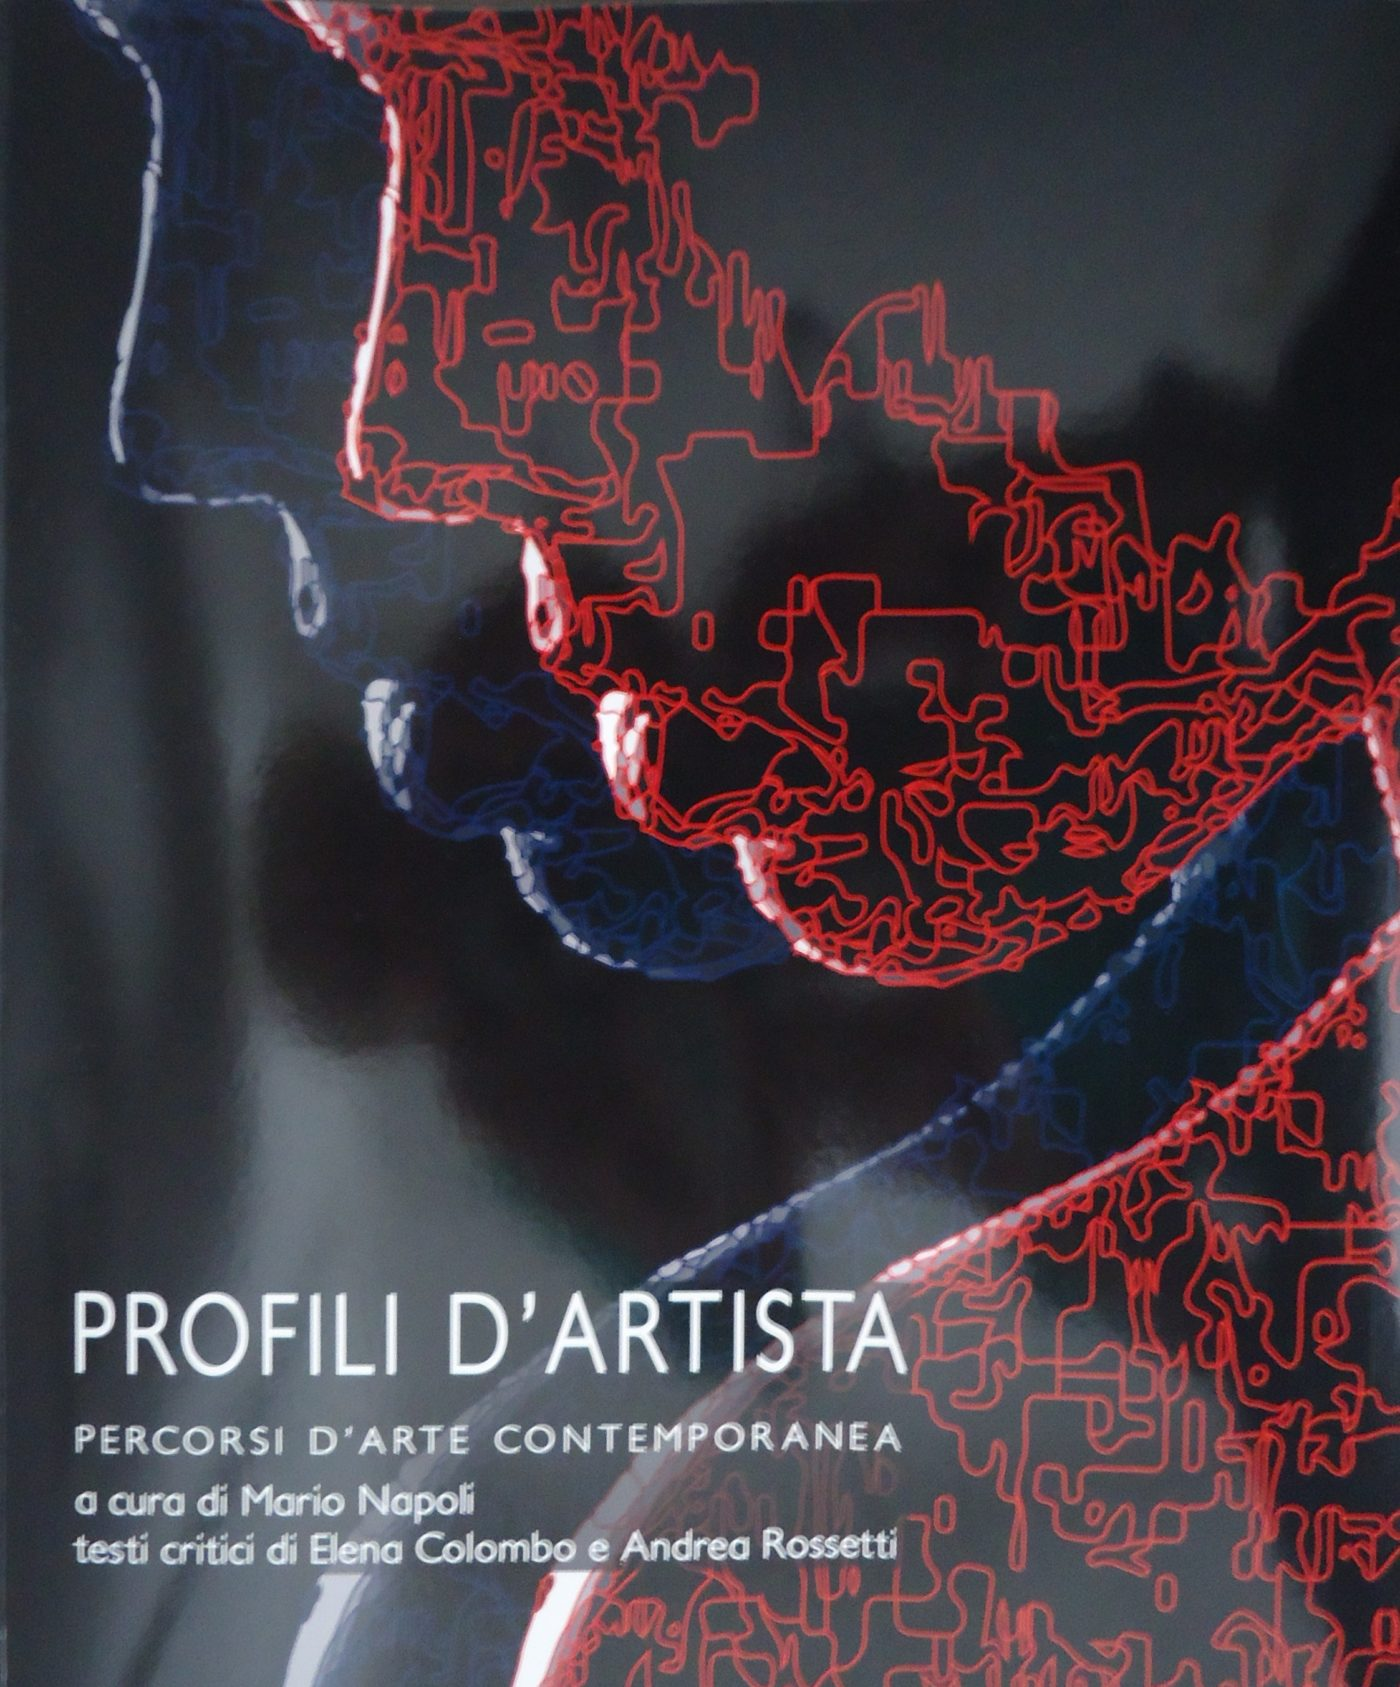 profili d'artista